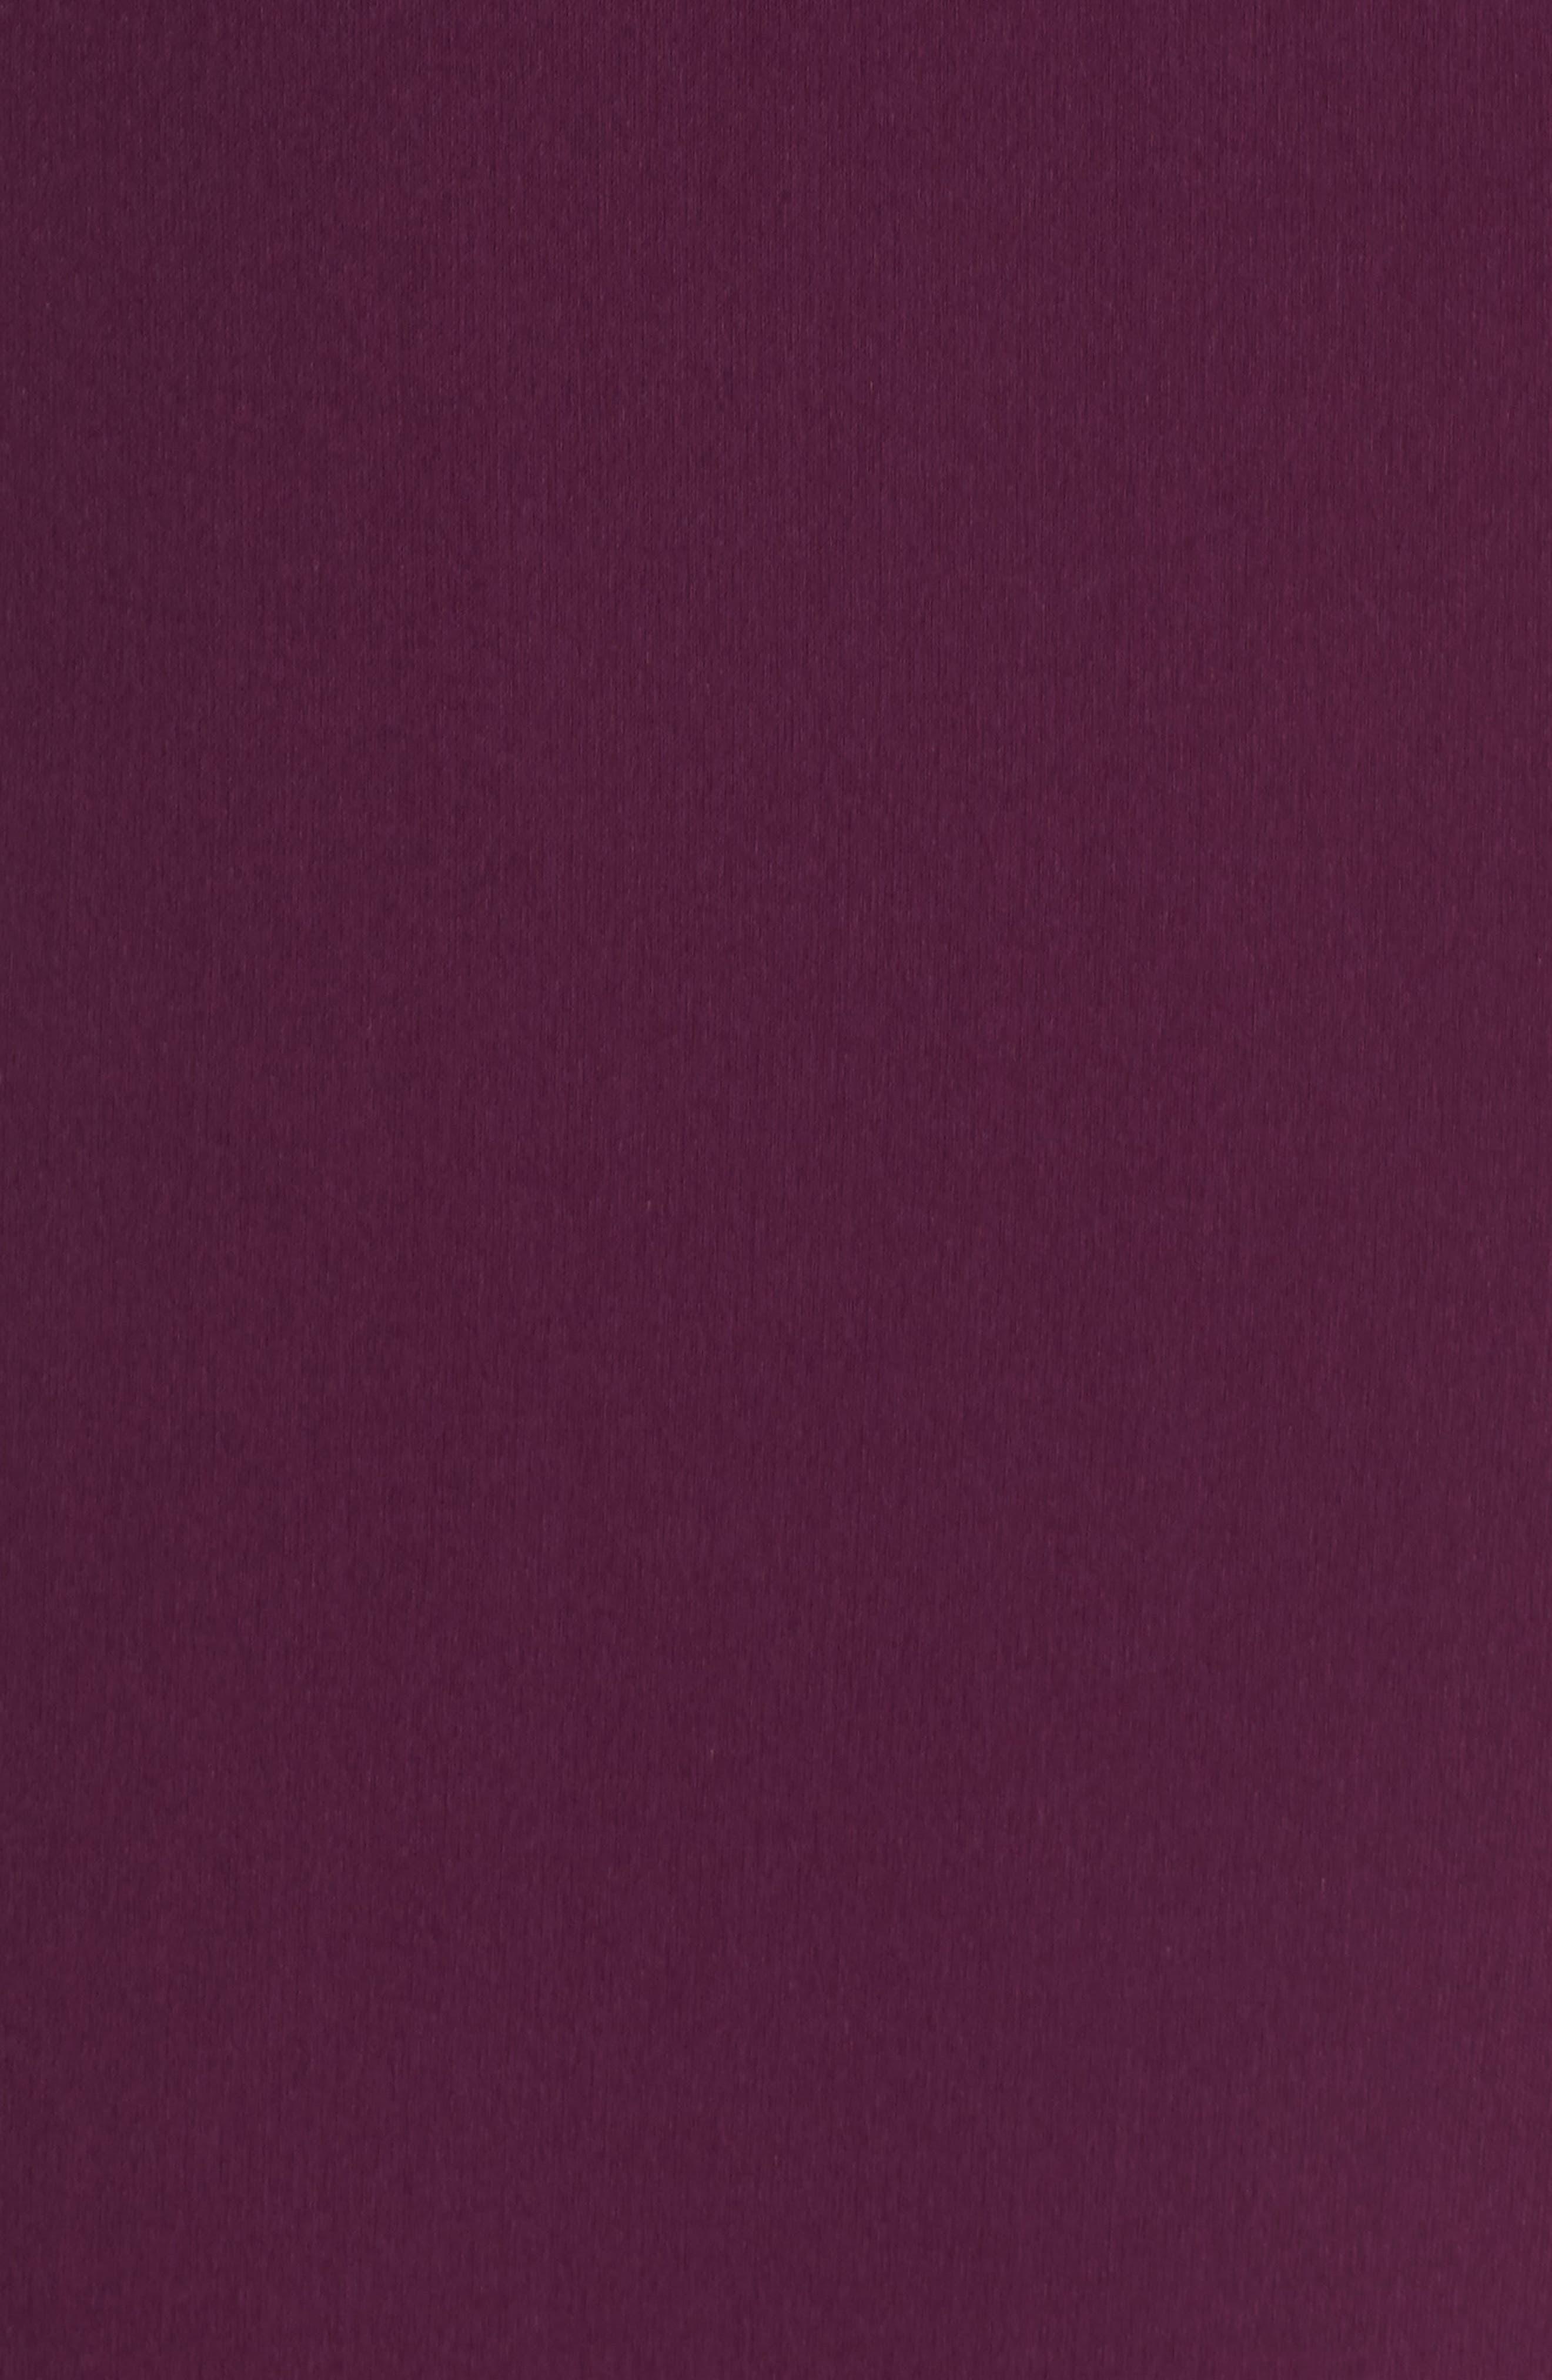 Belted Crepe Sheath Dress,                             Alternate thumbnail 6, color,                             606